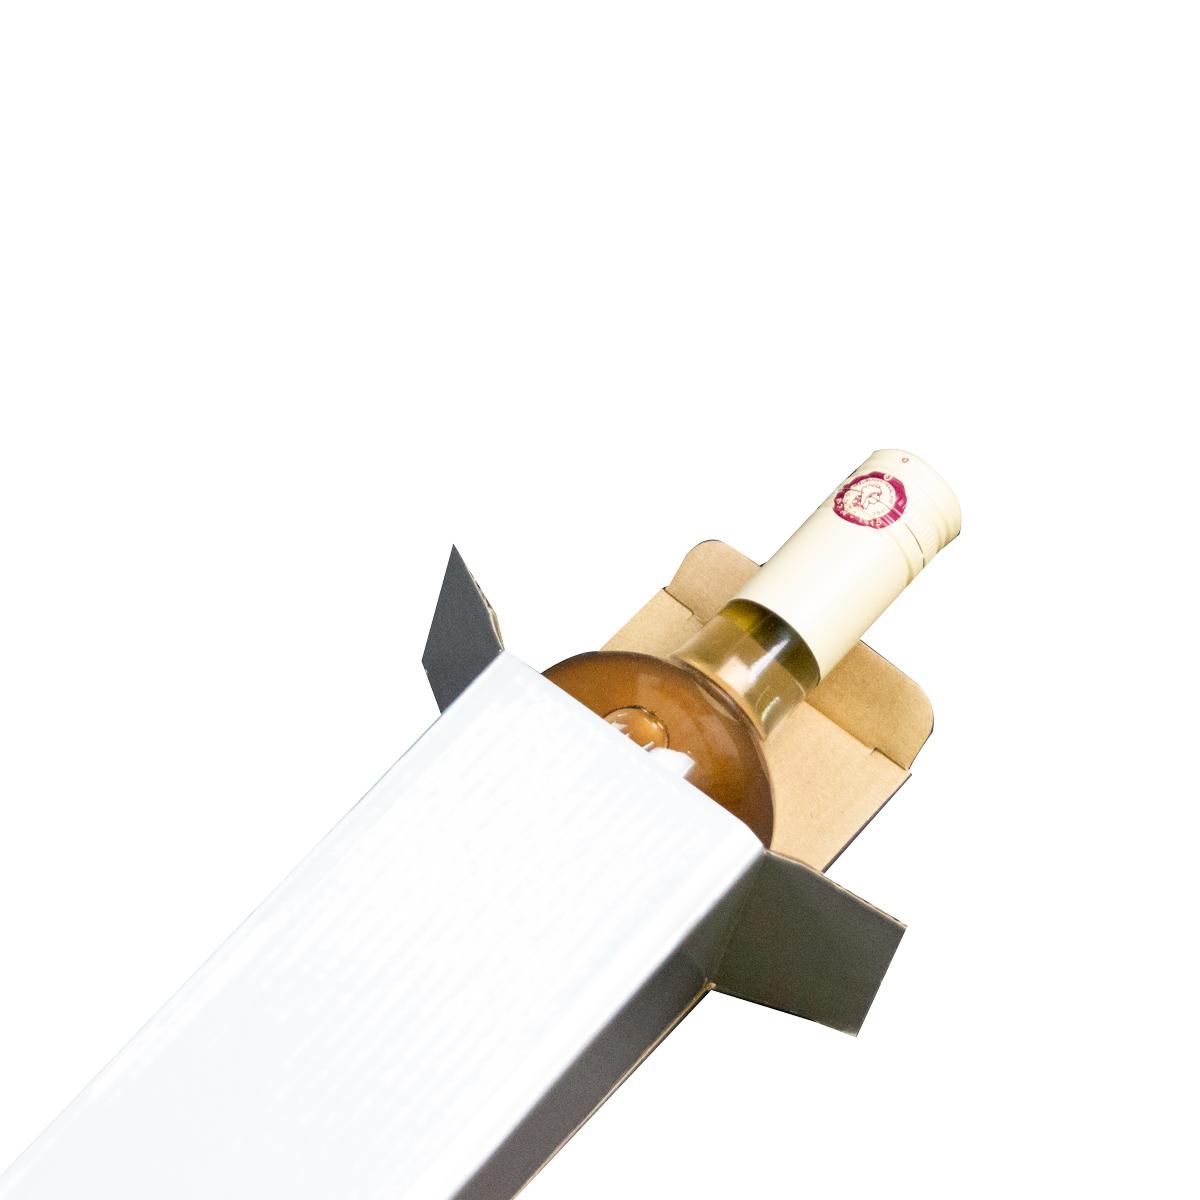 Kartonnen wijnflesdozen